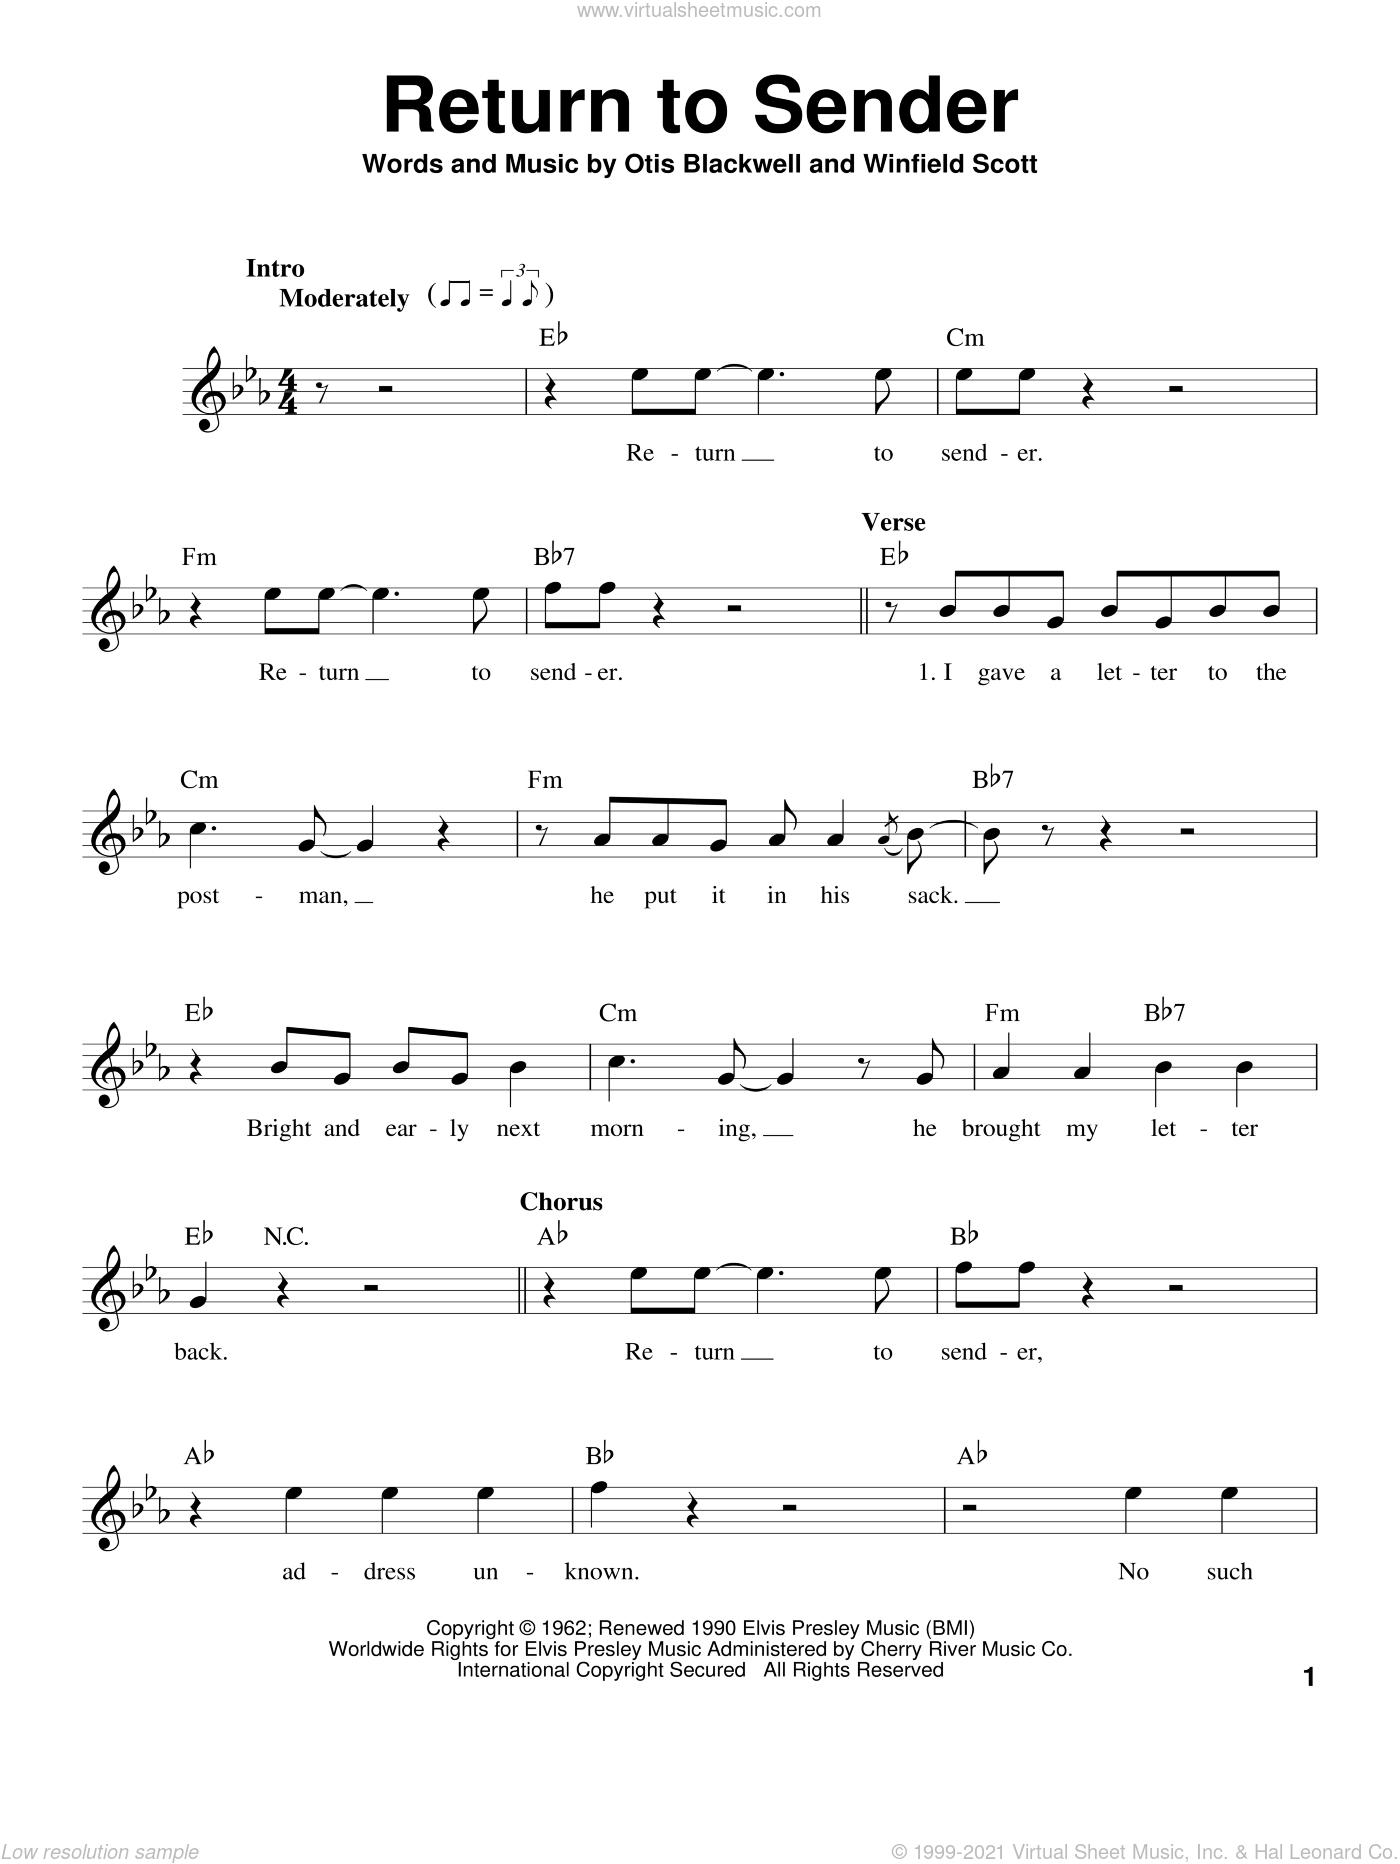 Return To Sender sheet music for voice solo by Elvis Presley, Otis Blackwell and Winfield Scott, intermediate skill level